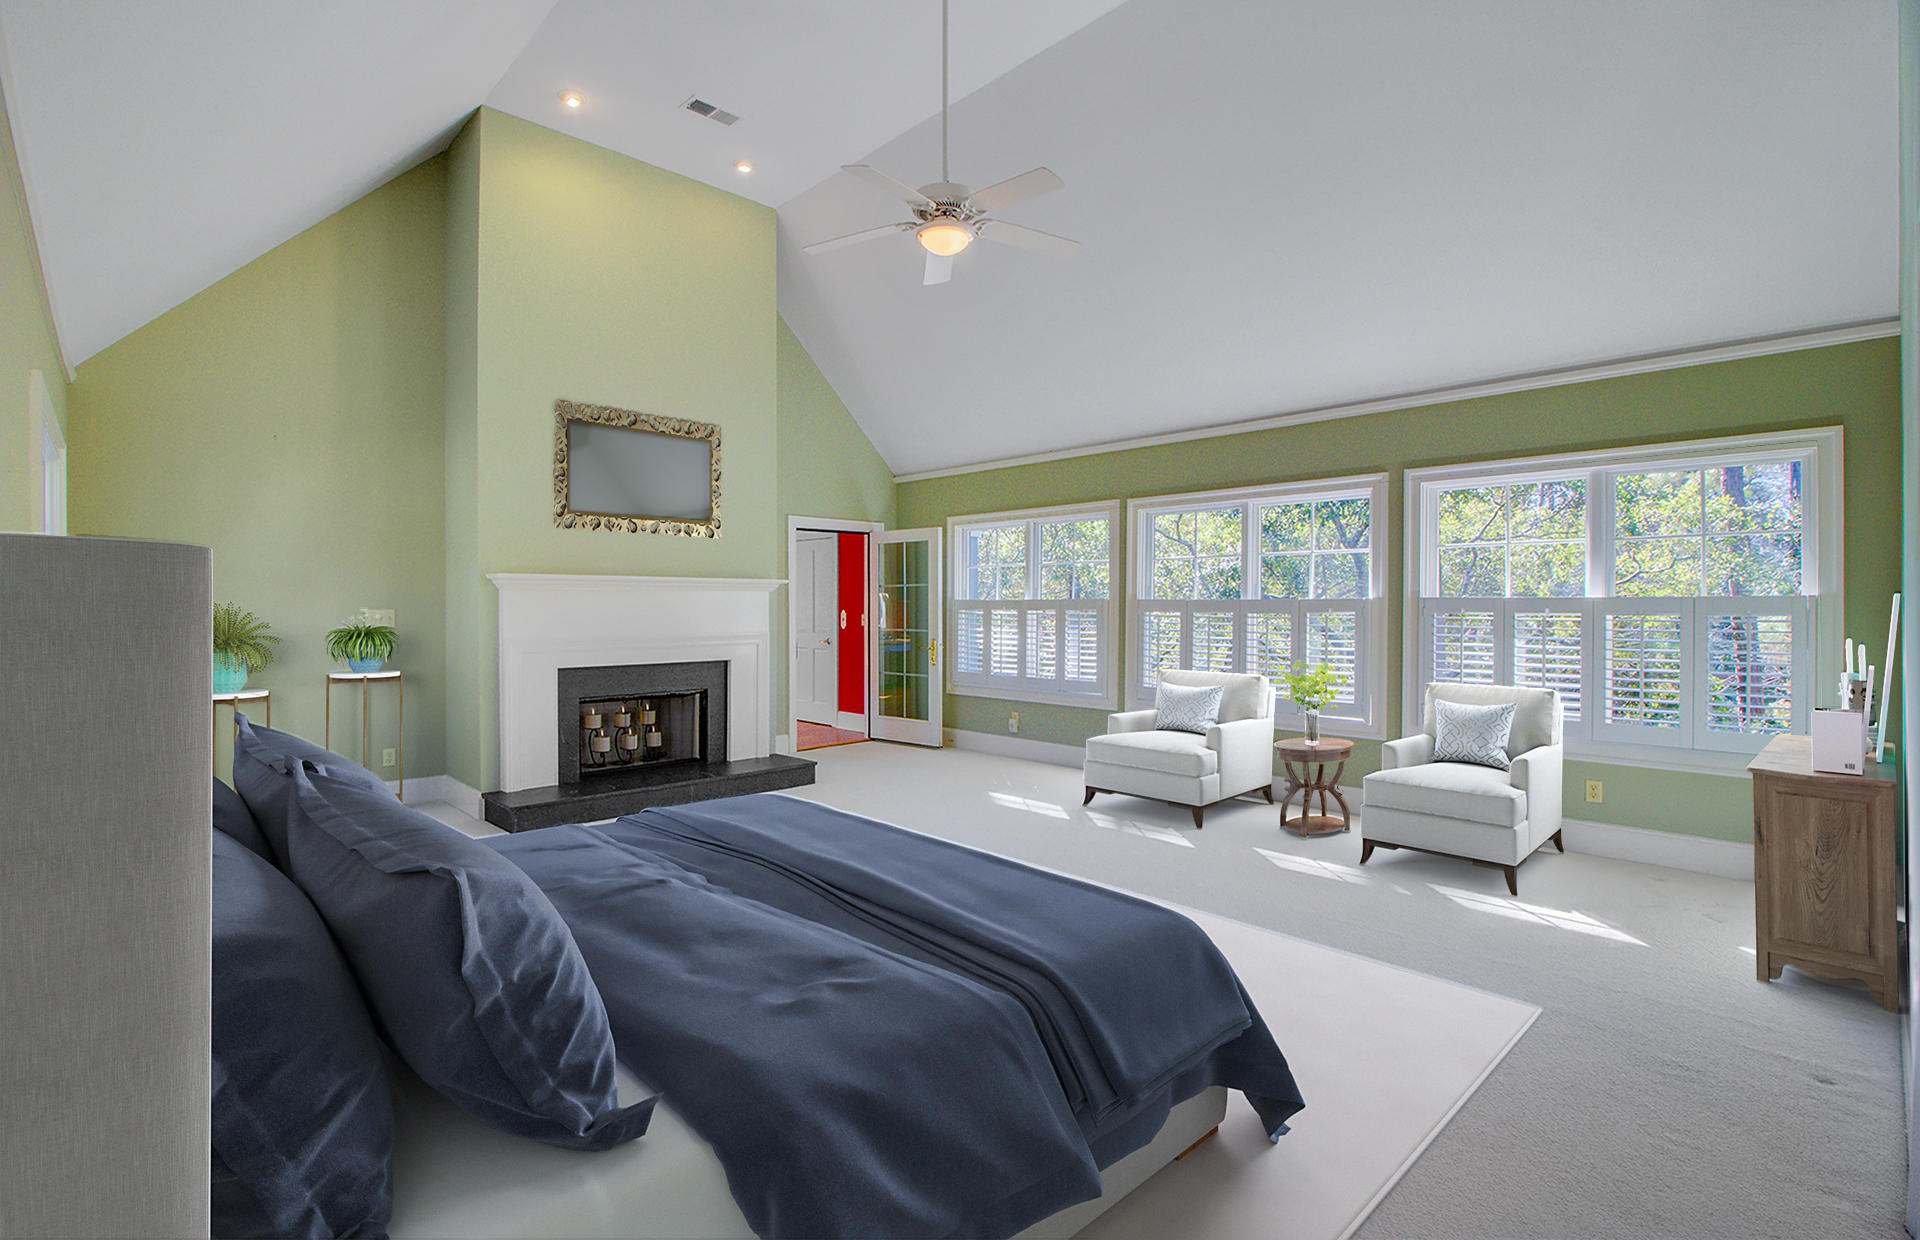 Kiawah Island Homes For Sale - 402 Ocean Oaks, Kiawah Island, SC - 31